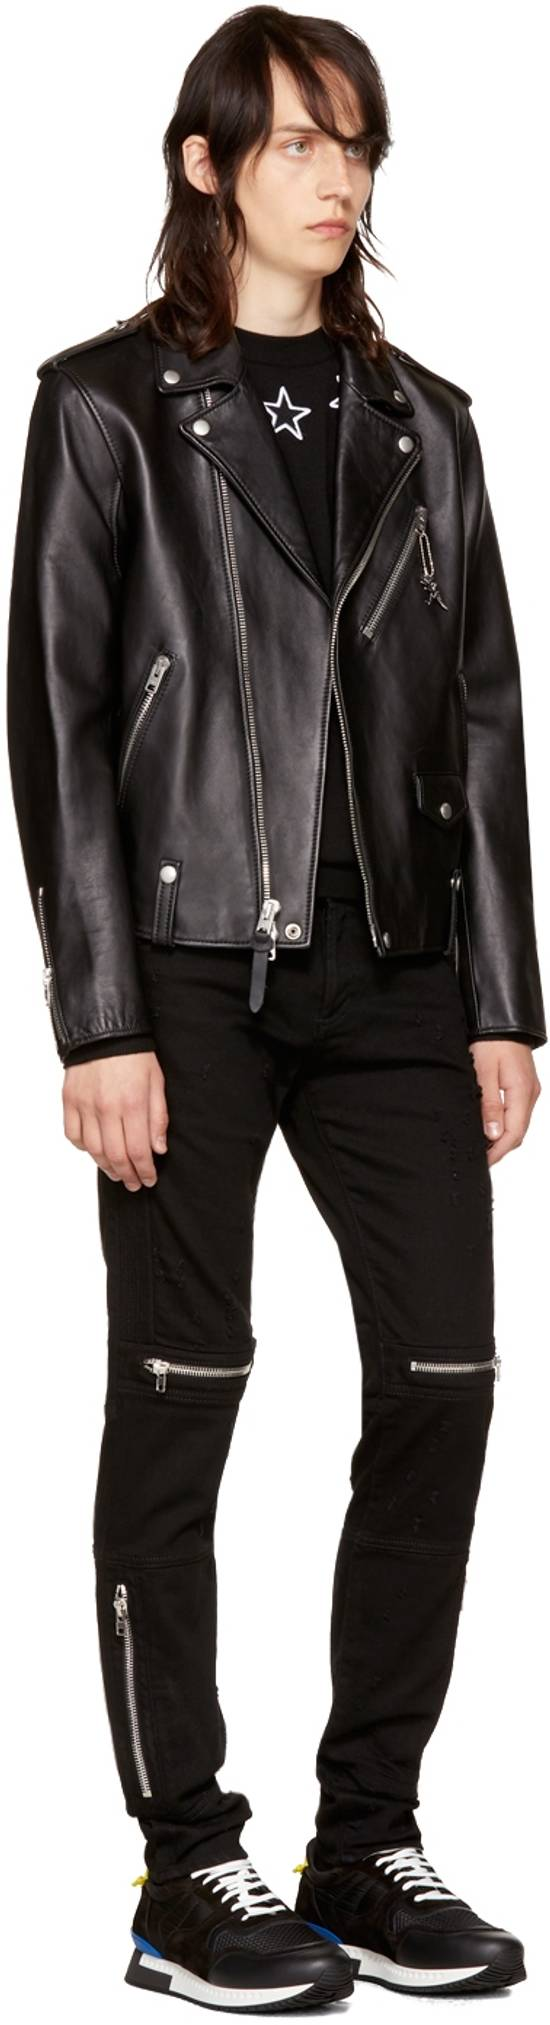 Givenchy Distressed Denim Biker Skinny Jeans, Black Size US 34 / EU 50 - 2